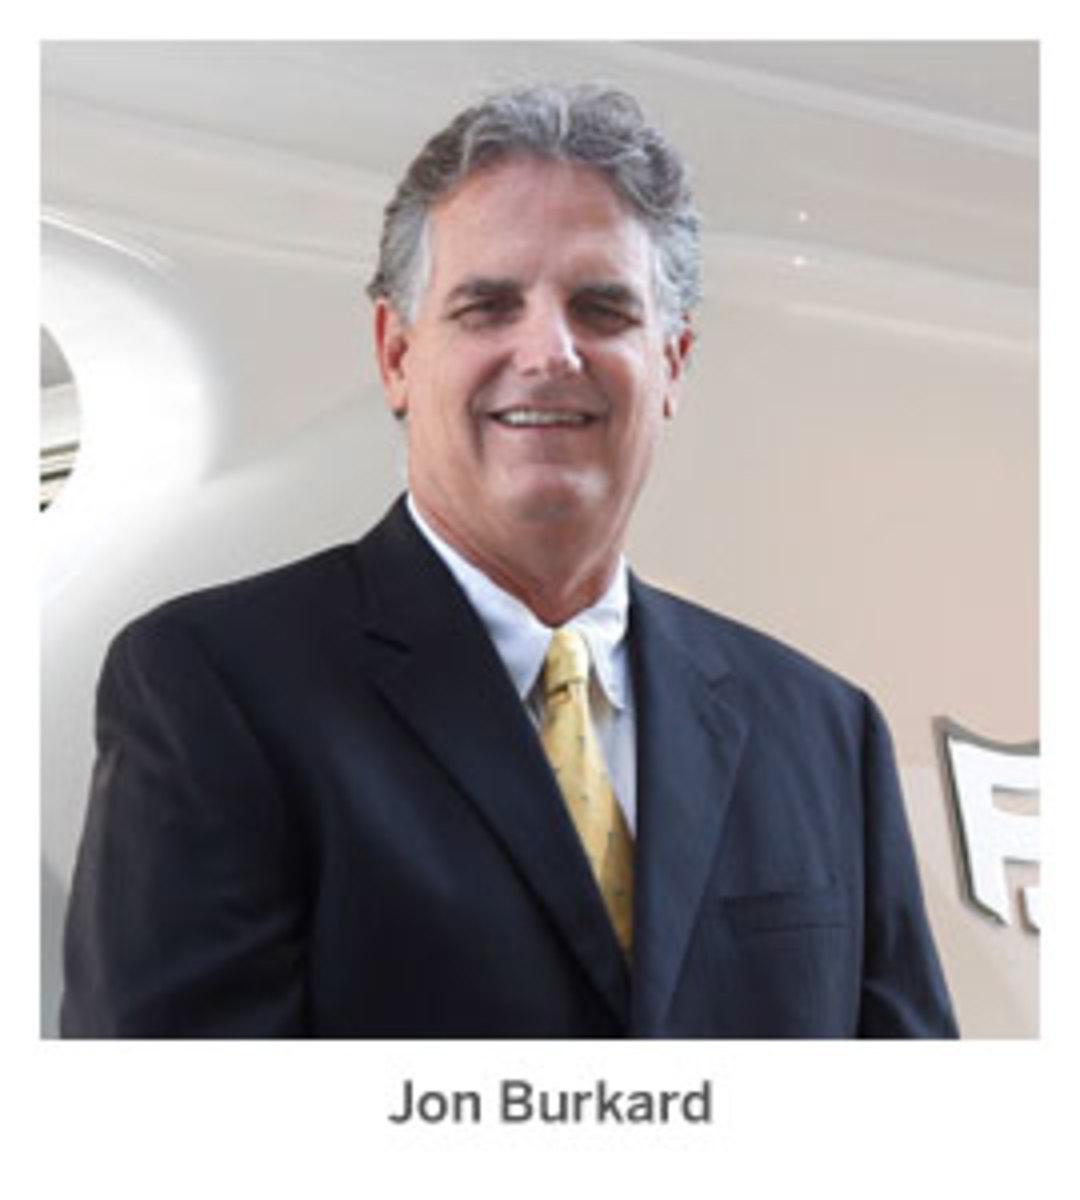 Jon Burkard, president, Allied Marine Brokerage